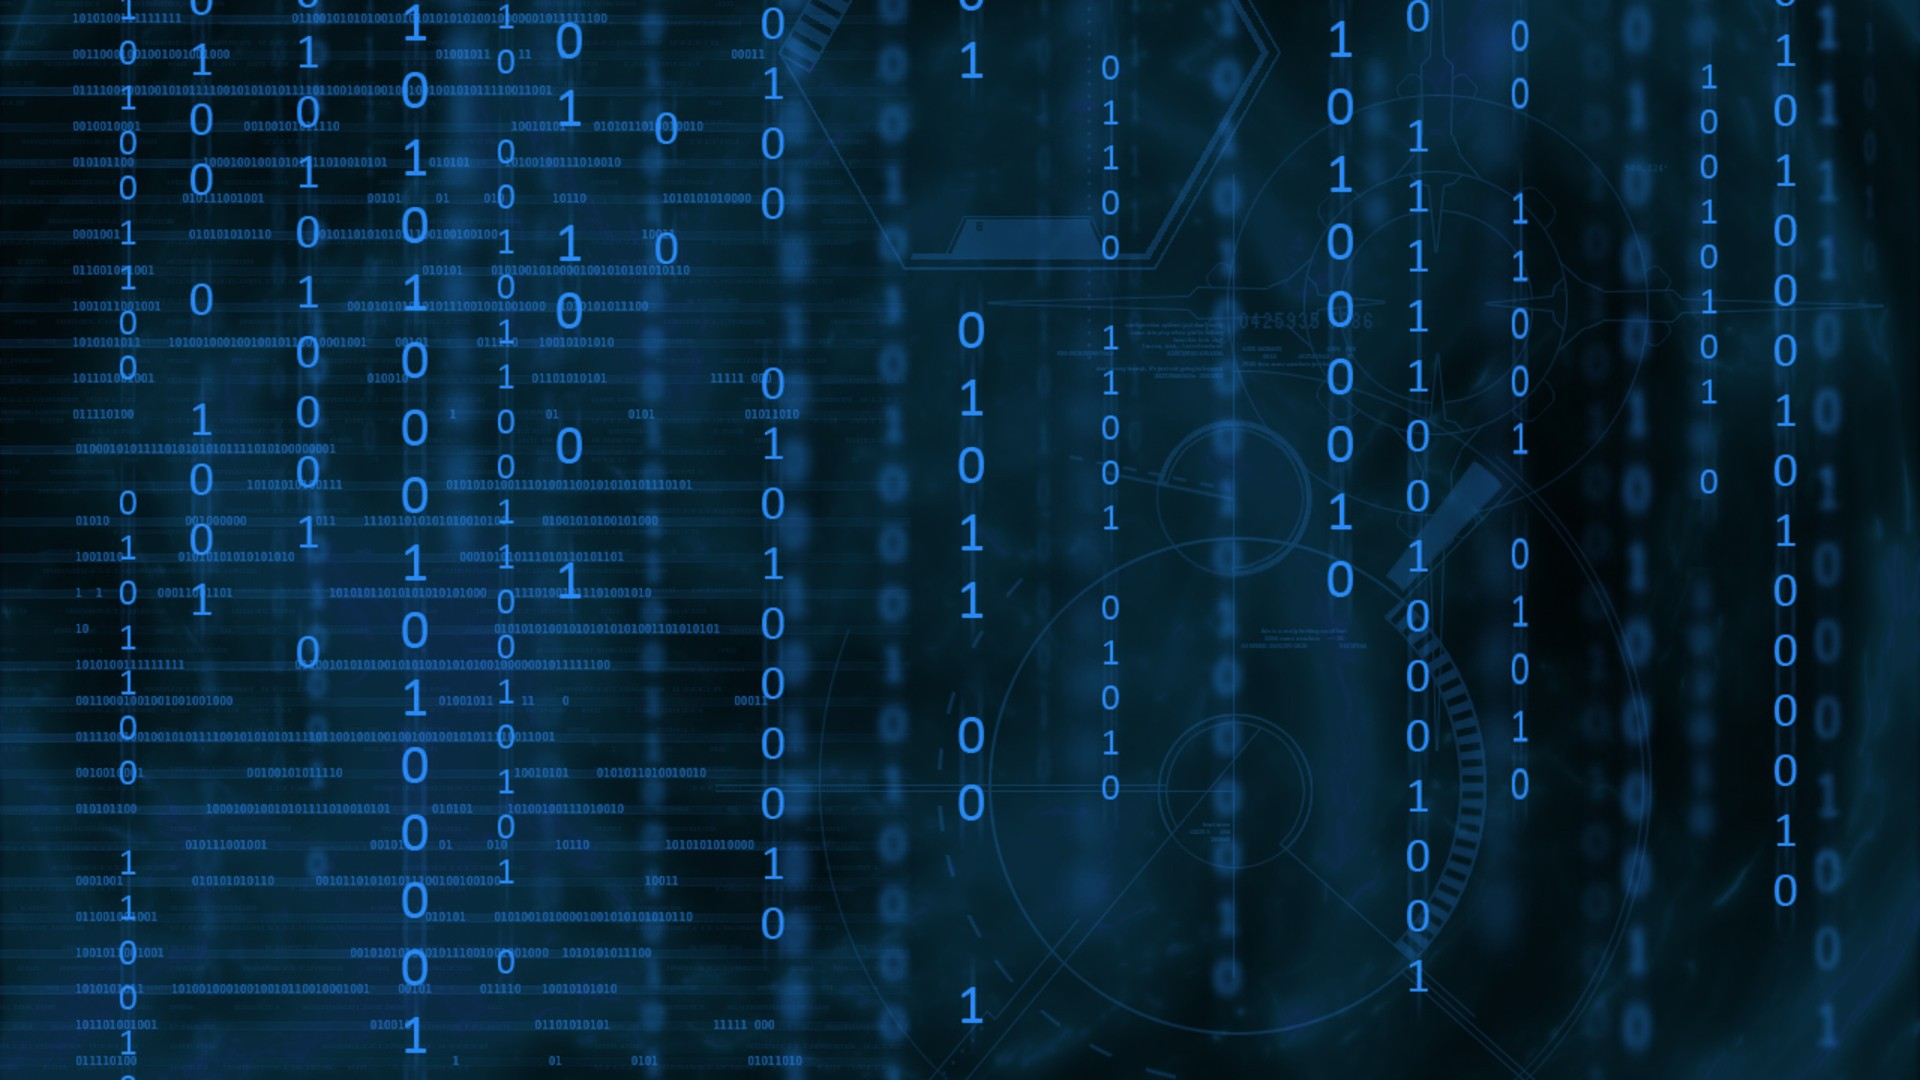 keyword tech wonderful hd wallpapers wallpaperlayer k ultra hd hitech wallpapers desktop backgrounds hd downloads 1920x1080